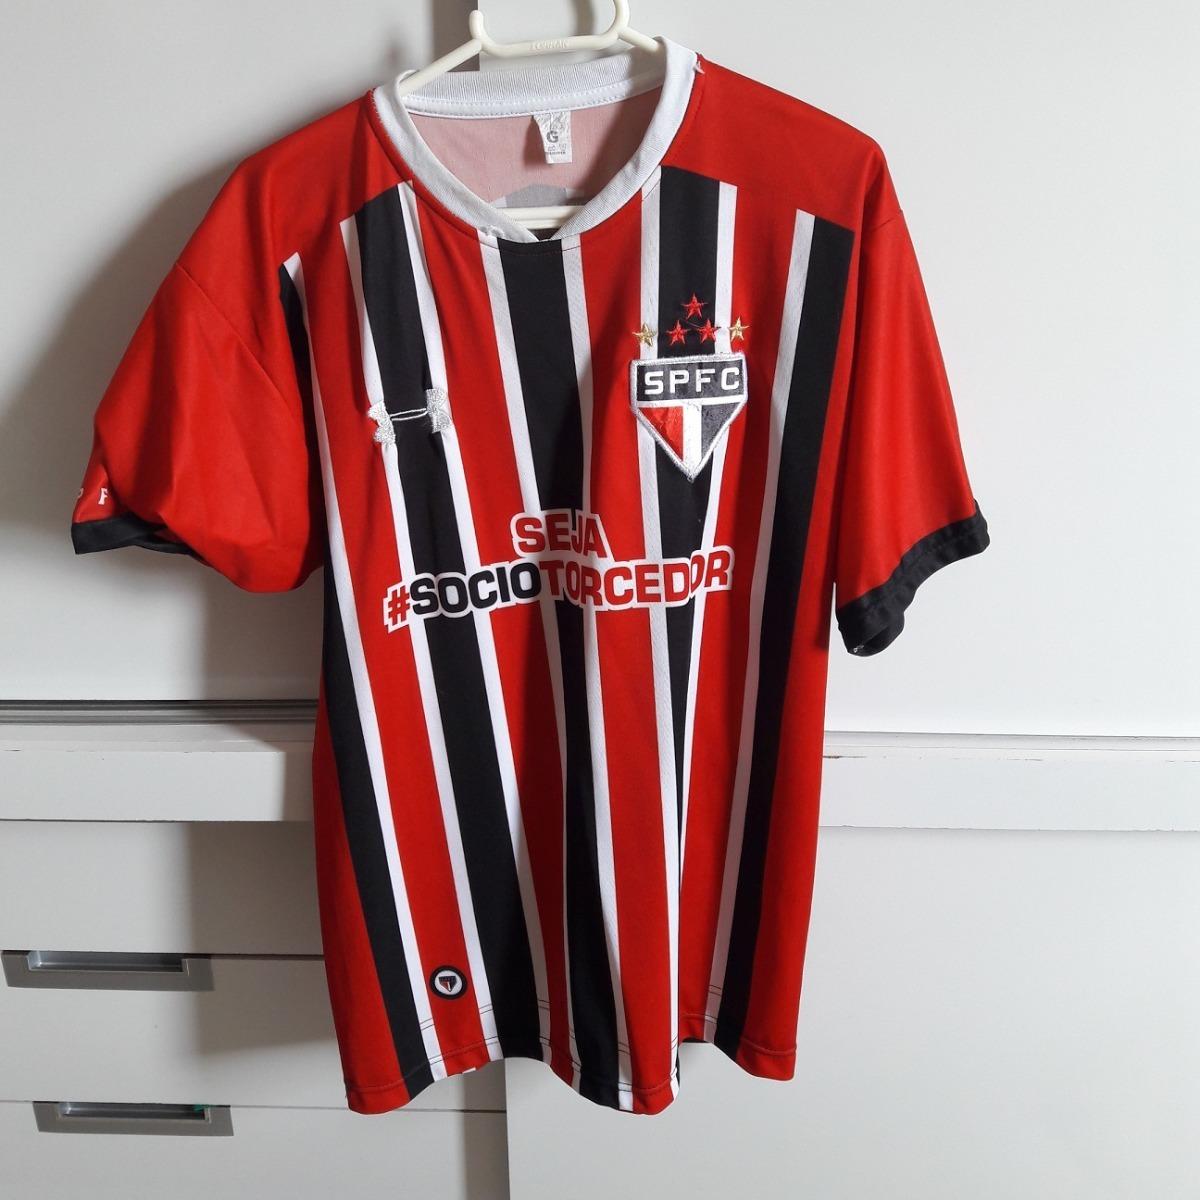 cb6a1f0238909 Camisa Futebol Antiga - Sao Paulo - Tam G (51x73cm) - R  60